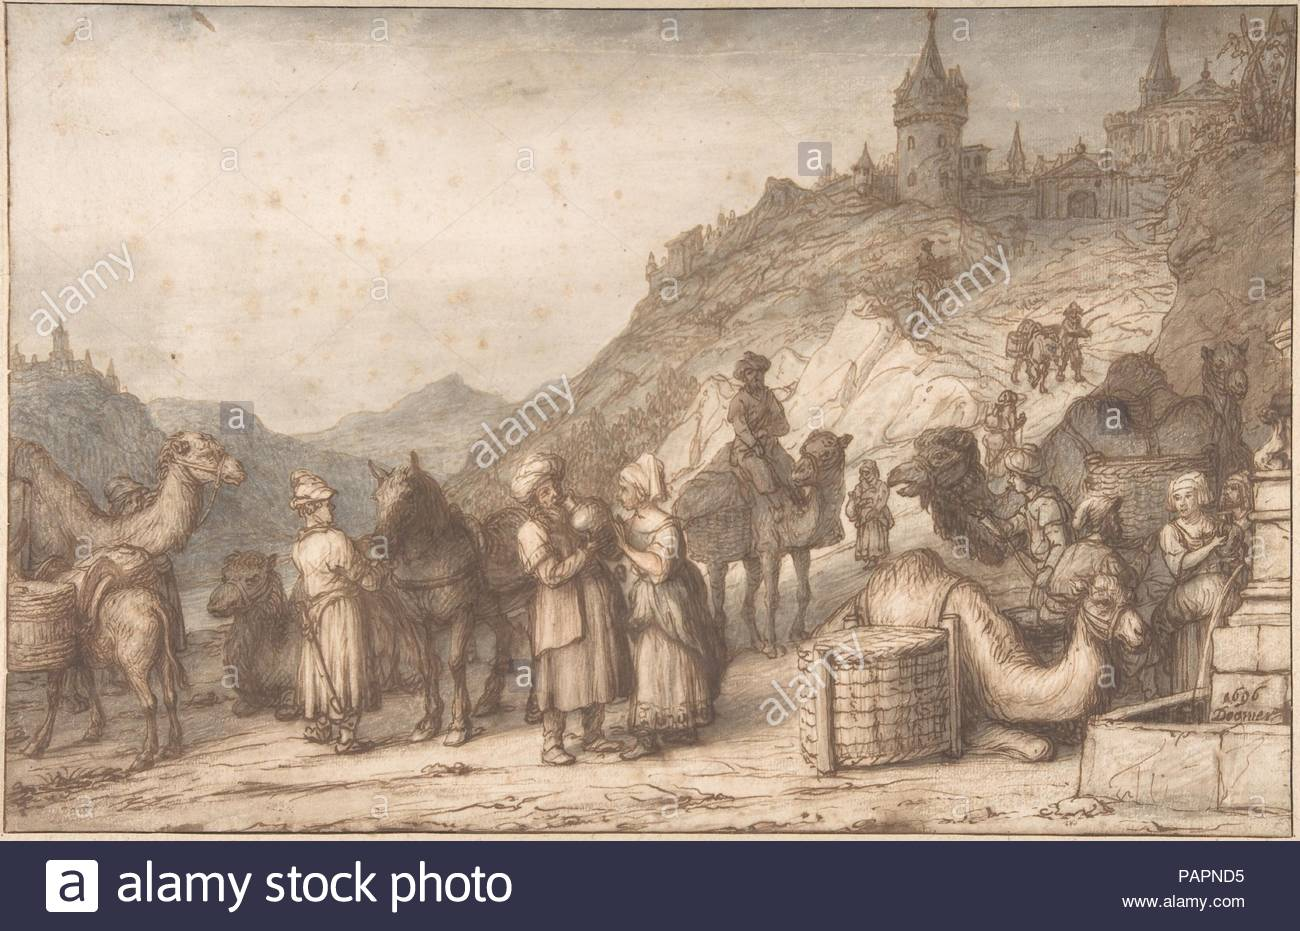 Artist: Lambert Doomer (Dutch, Amsterdam 1624-1700 Amsterdam). Dimensions:  sheet: 10 3/8 x 16 in. (26.3 x 40.6 cm). Date: 1696.